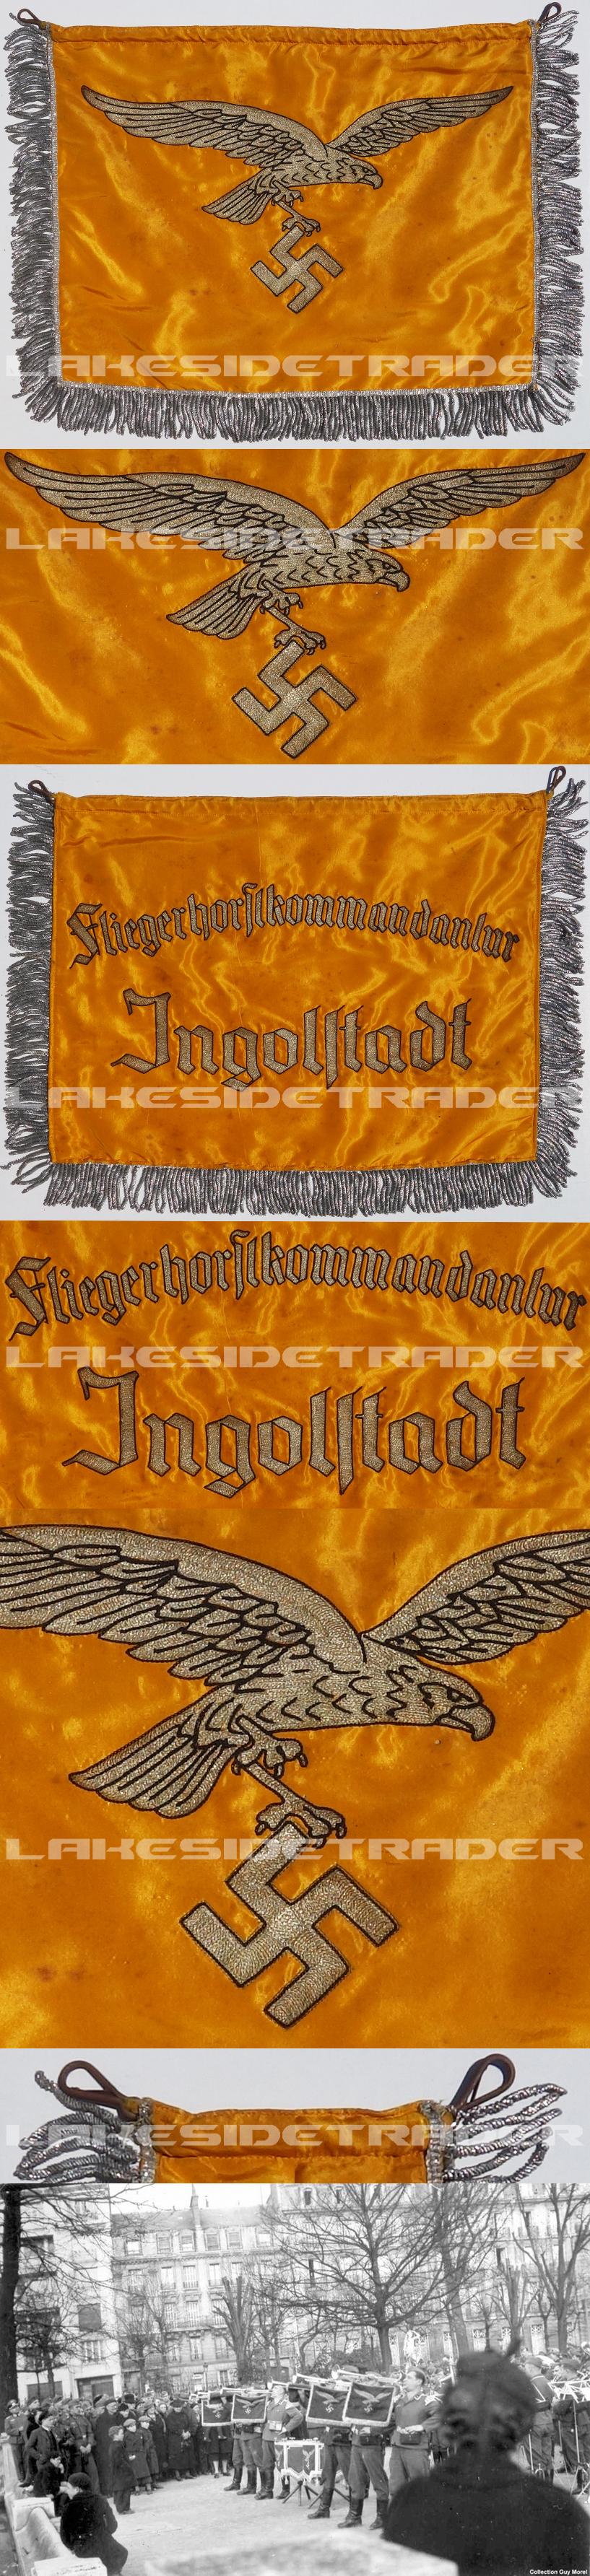 "Luftwaffe ""Ingolstadt"" Trumpet Banner"